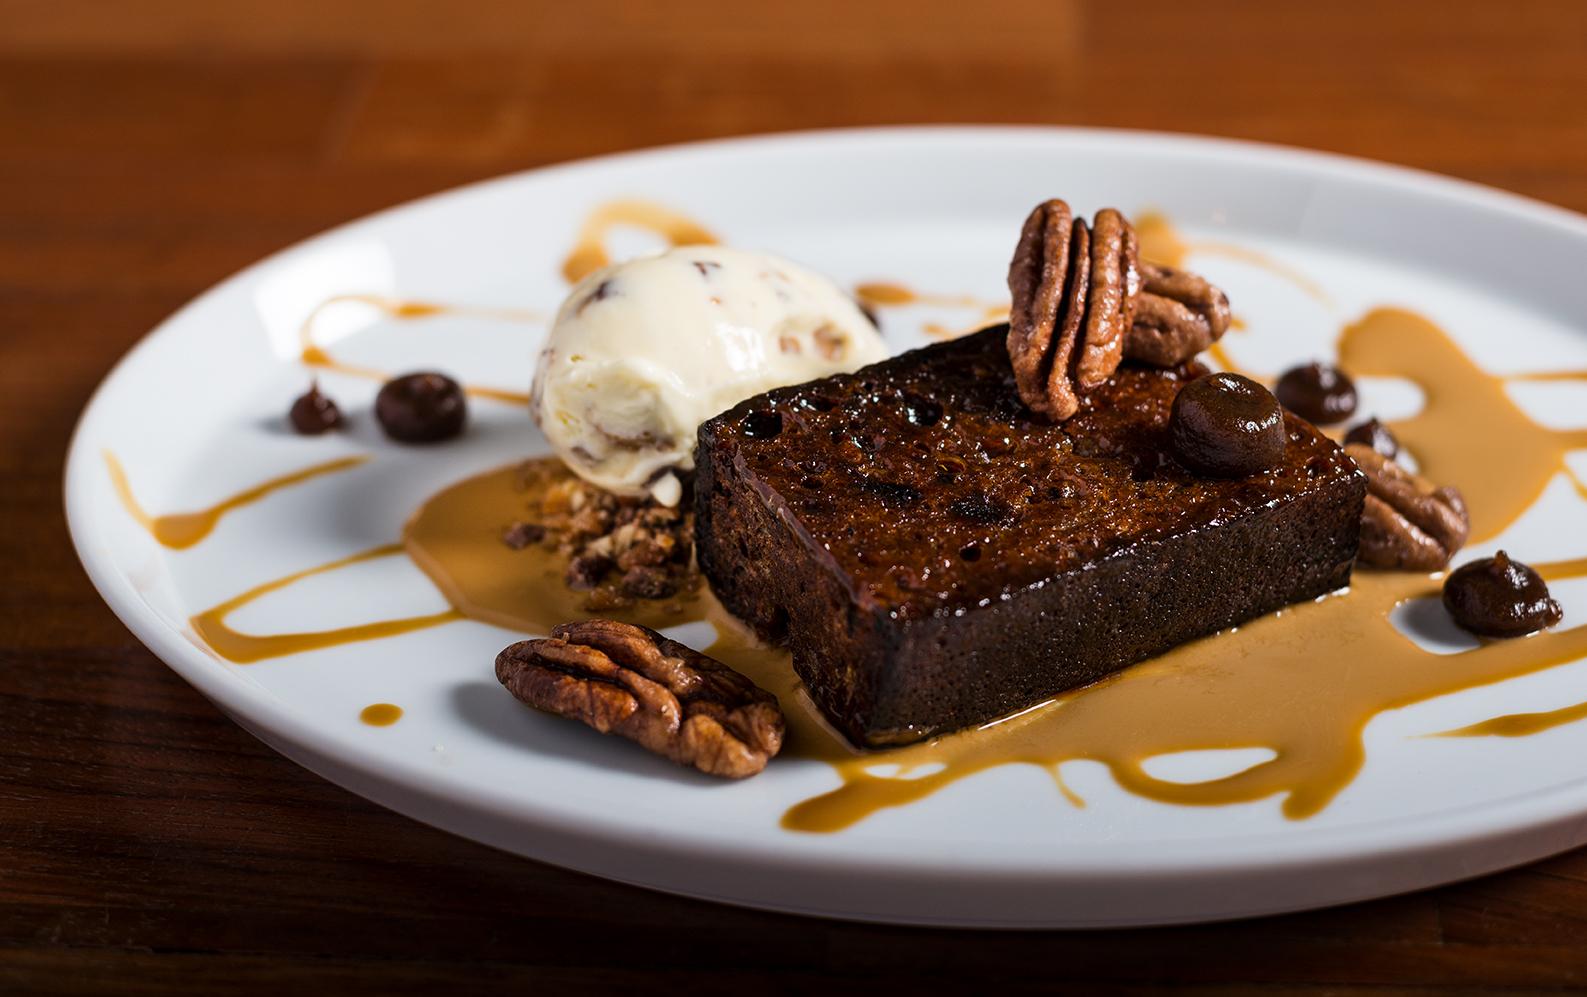 Blink_chocolate dessert